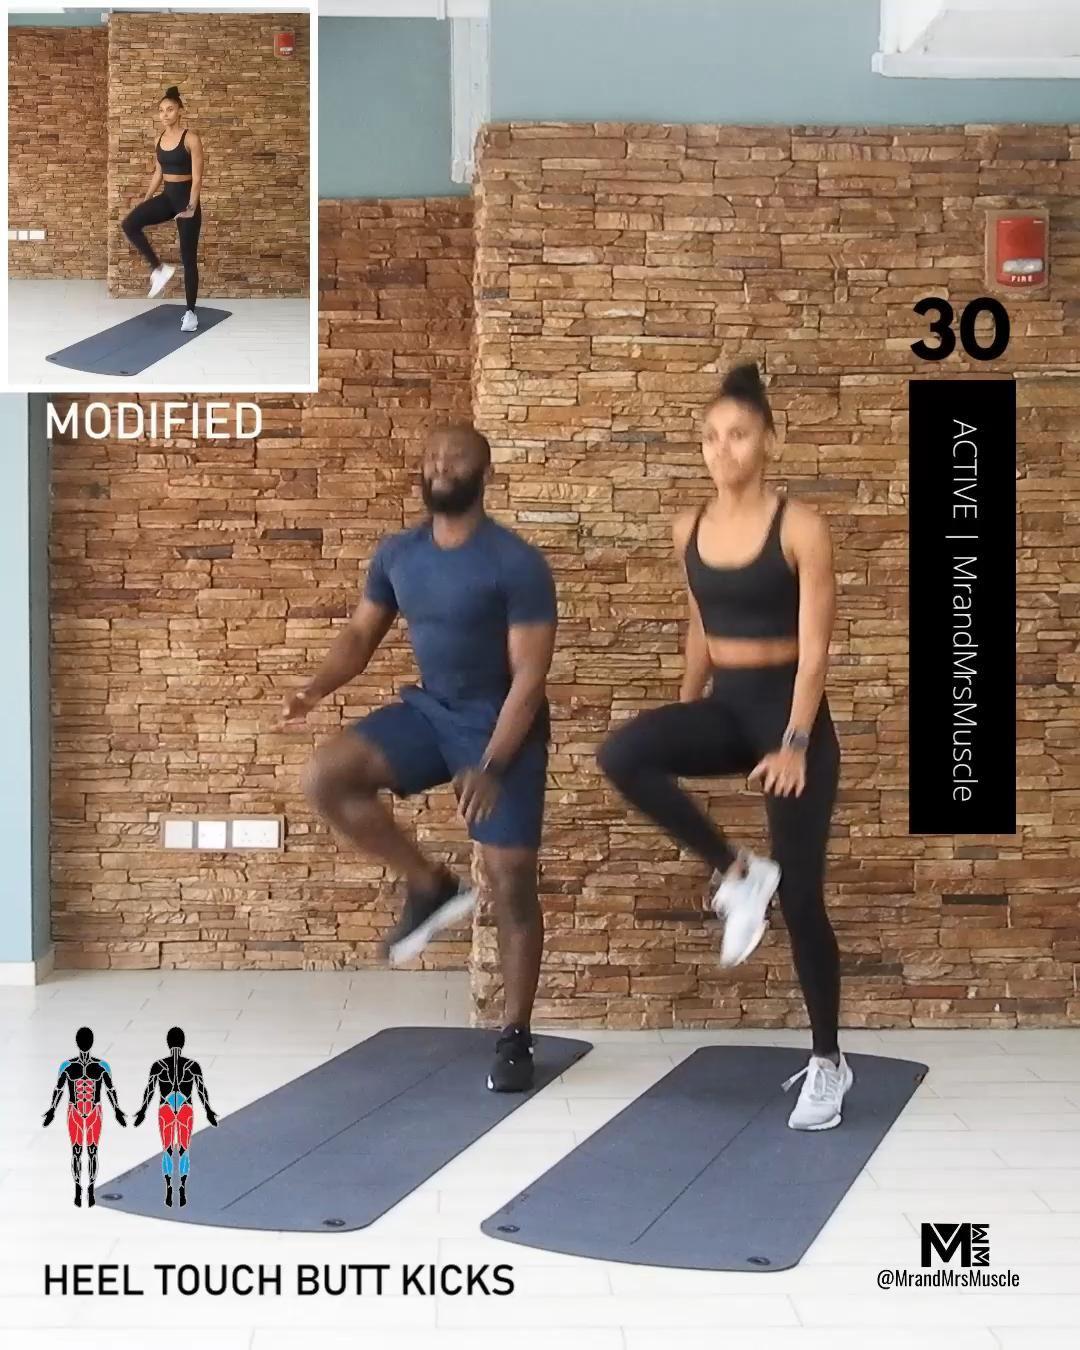 Sweaty Cardio Workout Home Or Gym Video Workout Videos Abs Workout Hiit Cardio Workouts